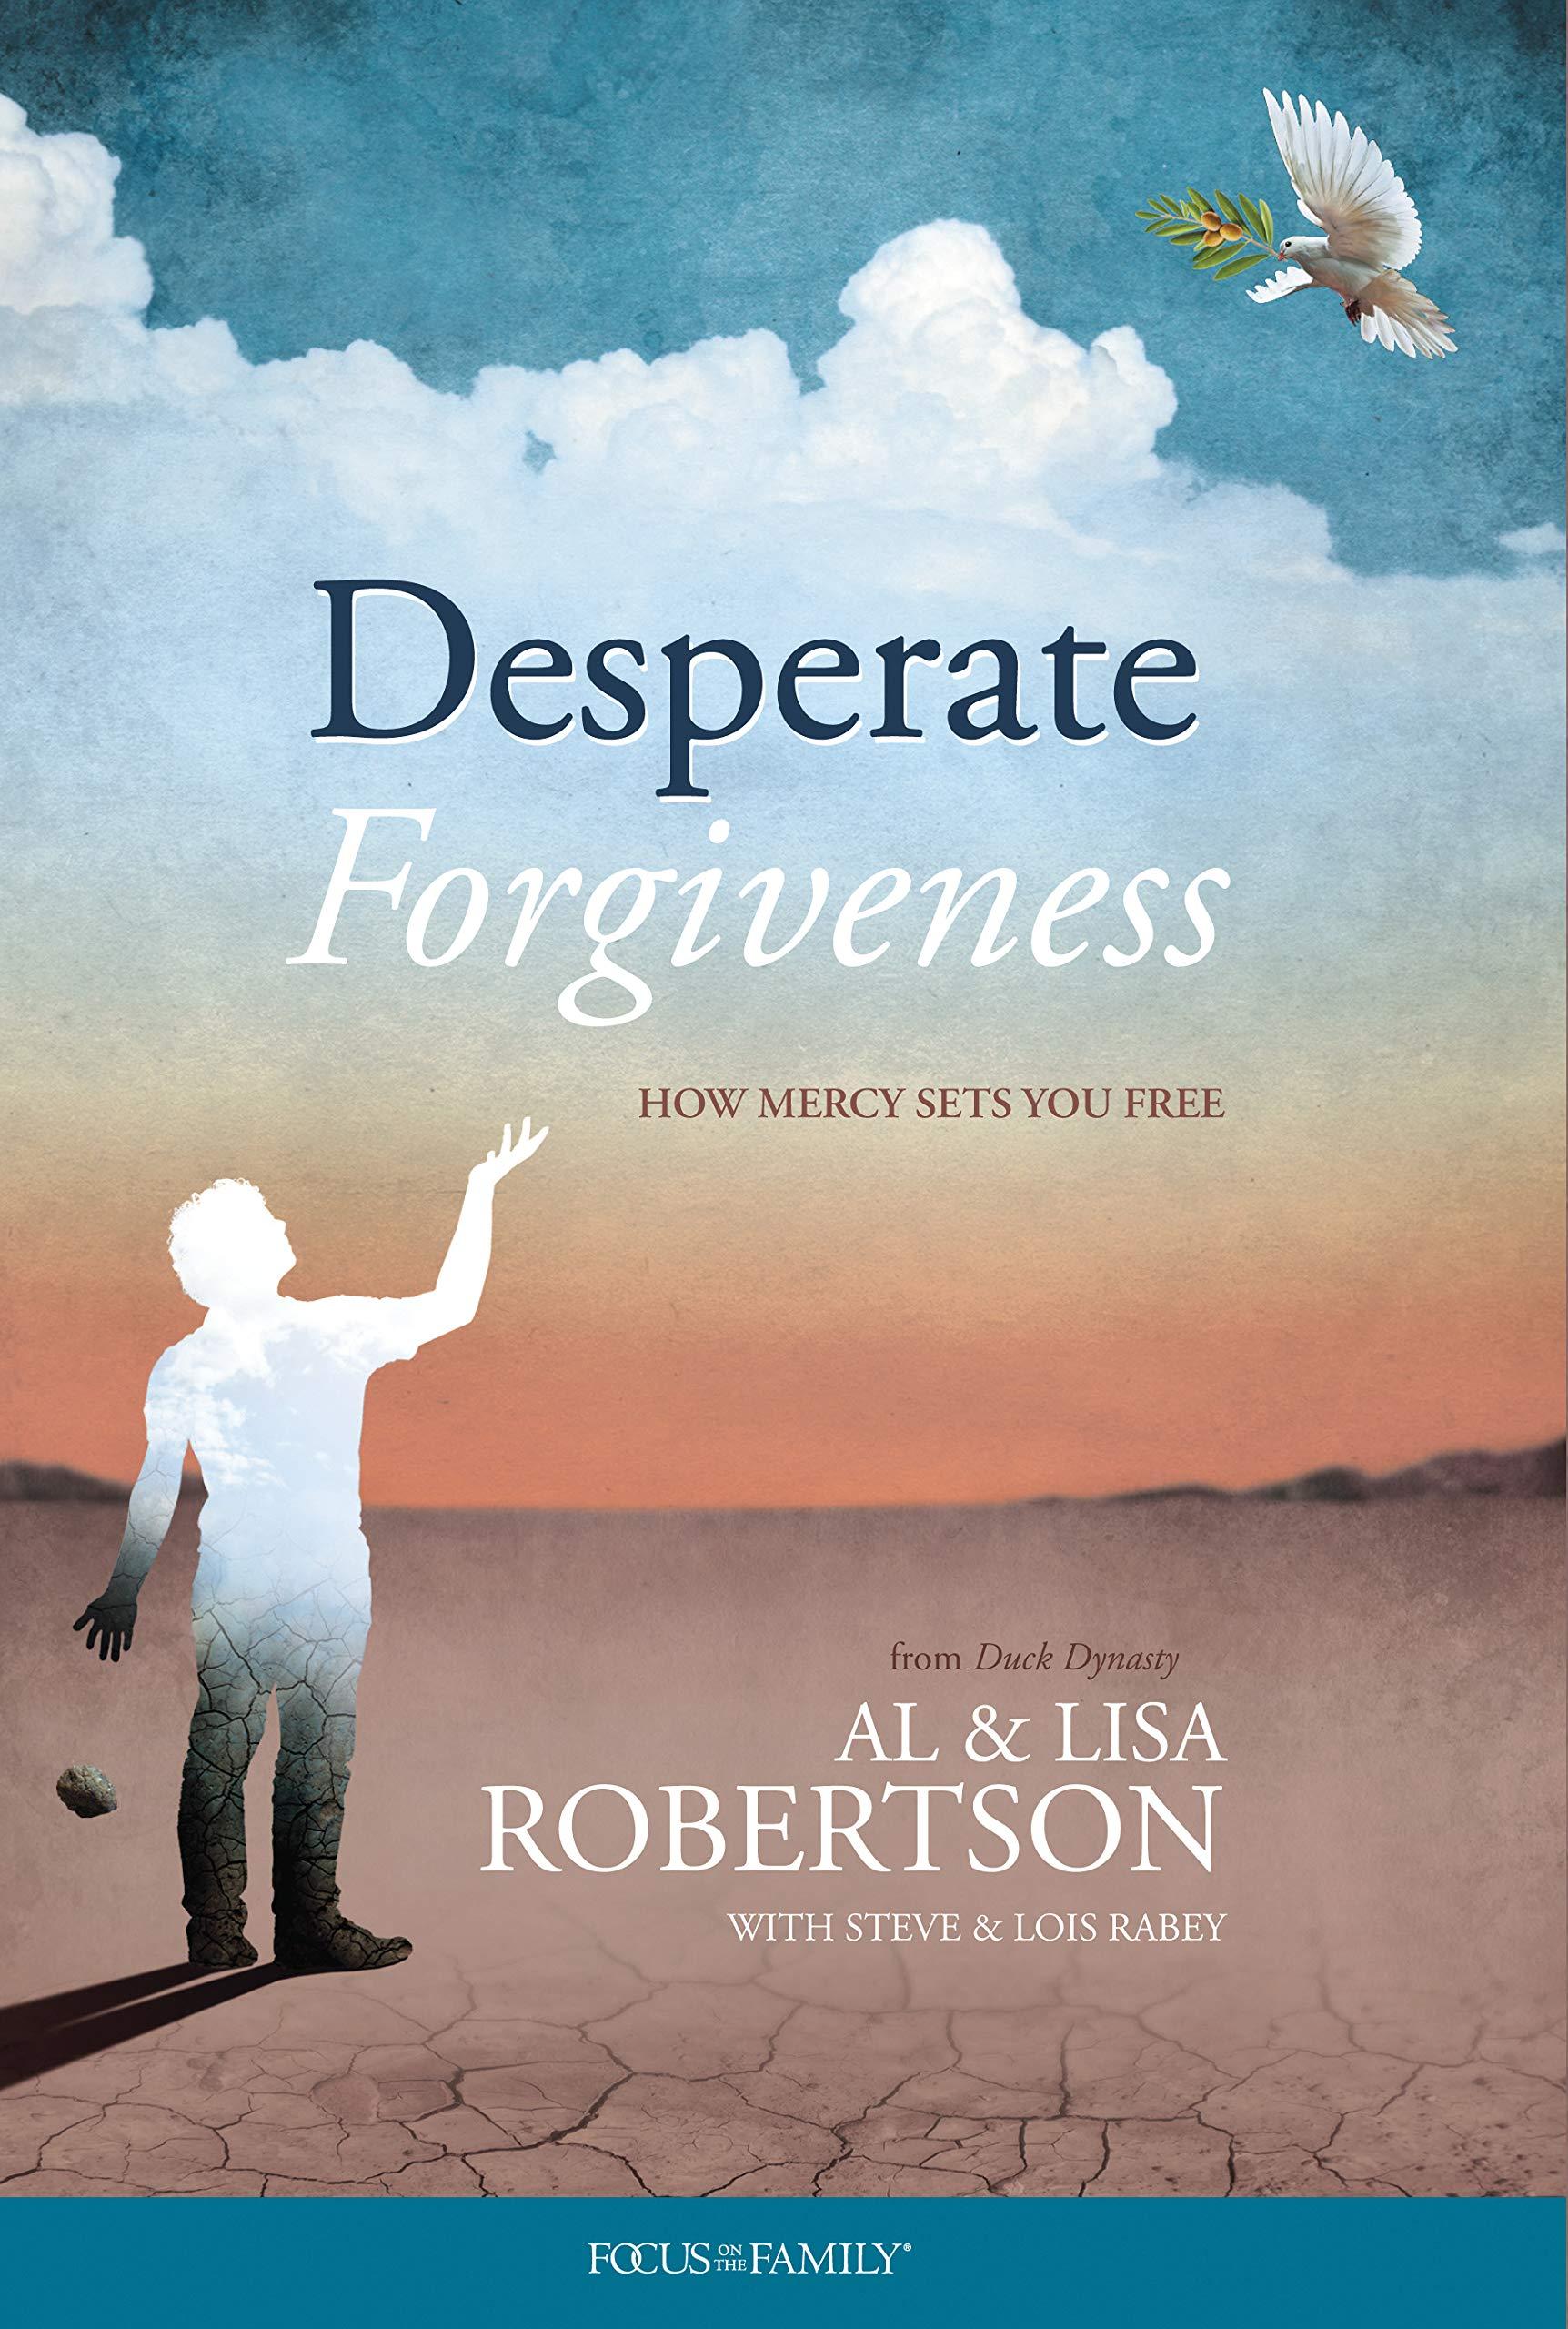 Desperate Forgiveness Robertson Al Robertson Lisa Rabey Steve Rabey Lois 9781589970311 Amazon Com Books The books i love right now are: desperate forgiveness robertson al